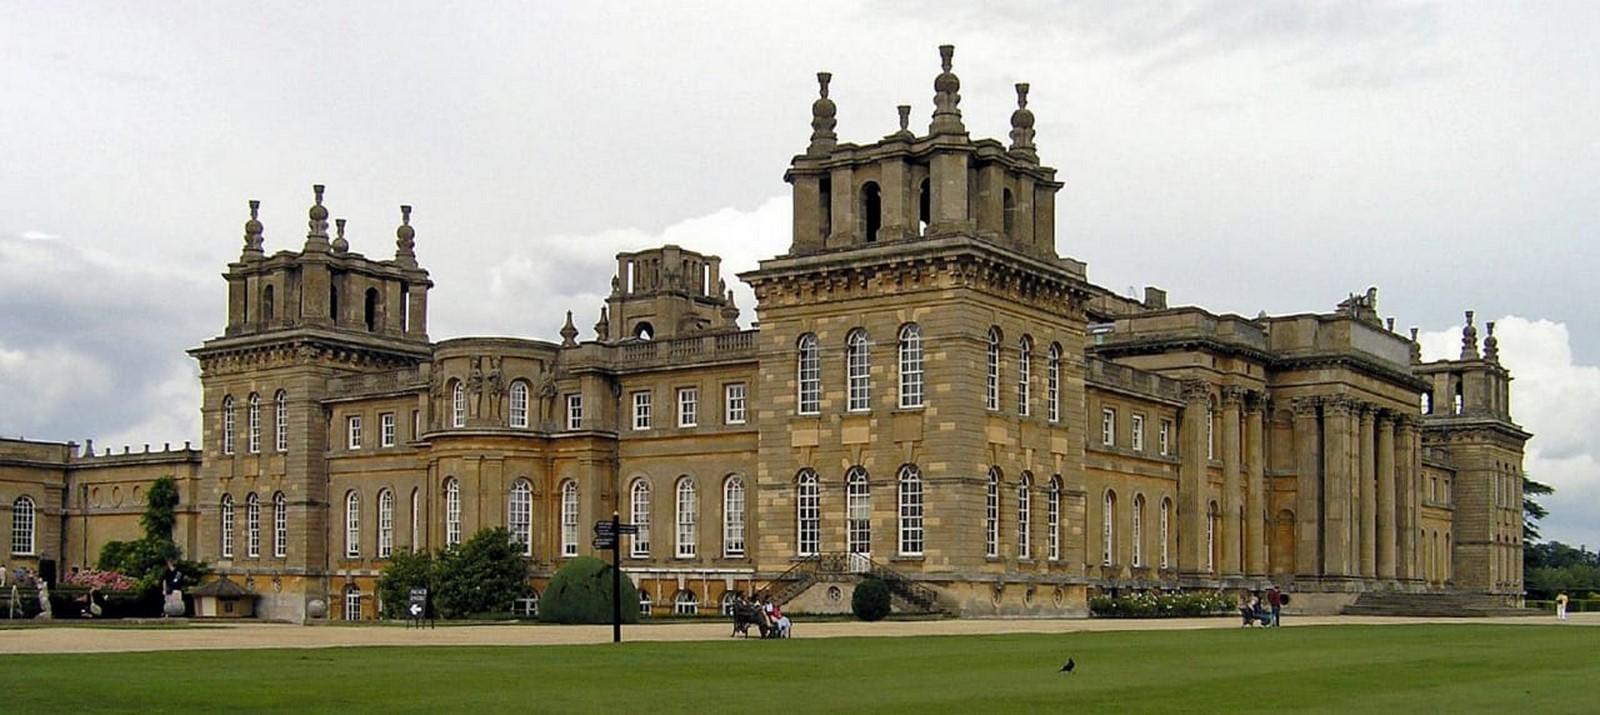 Blenheim Palace, Oxford - Sheet2